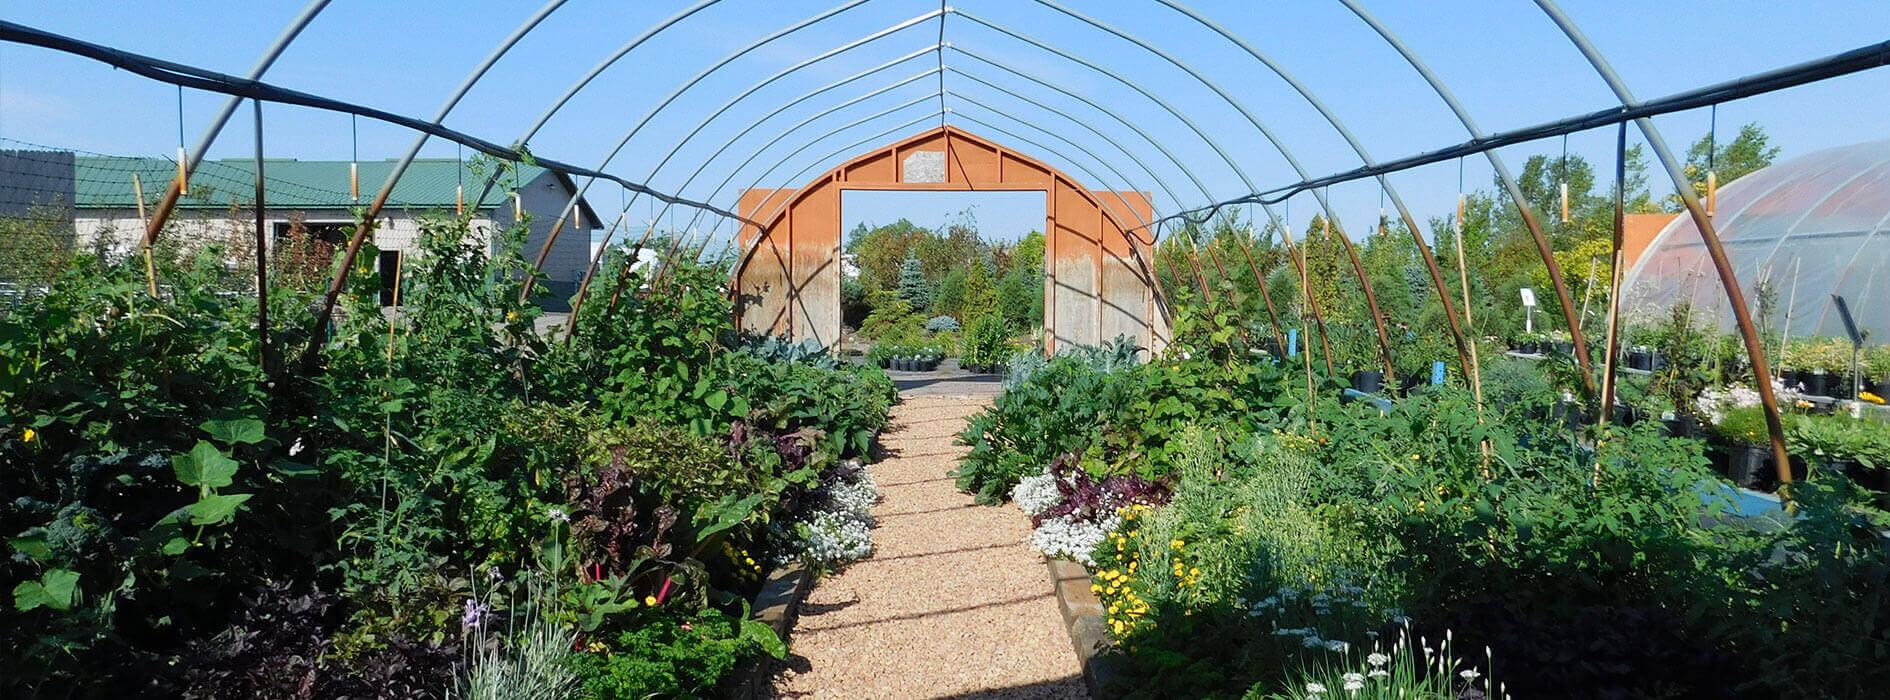 Heidis-GrowHaus-Lifestyle-Gardens_General-Banner5